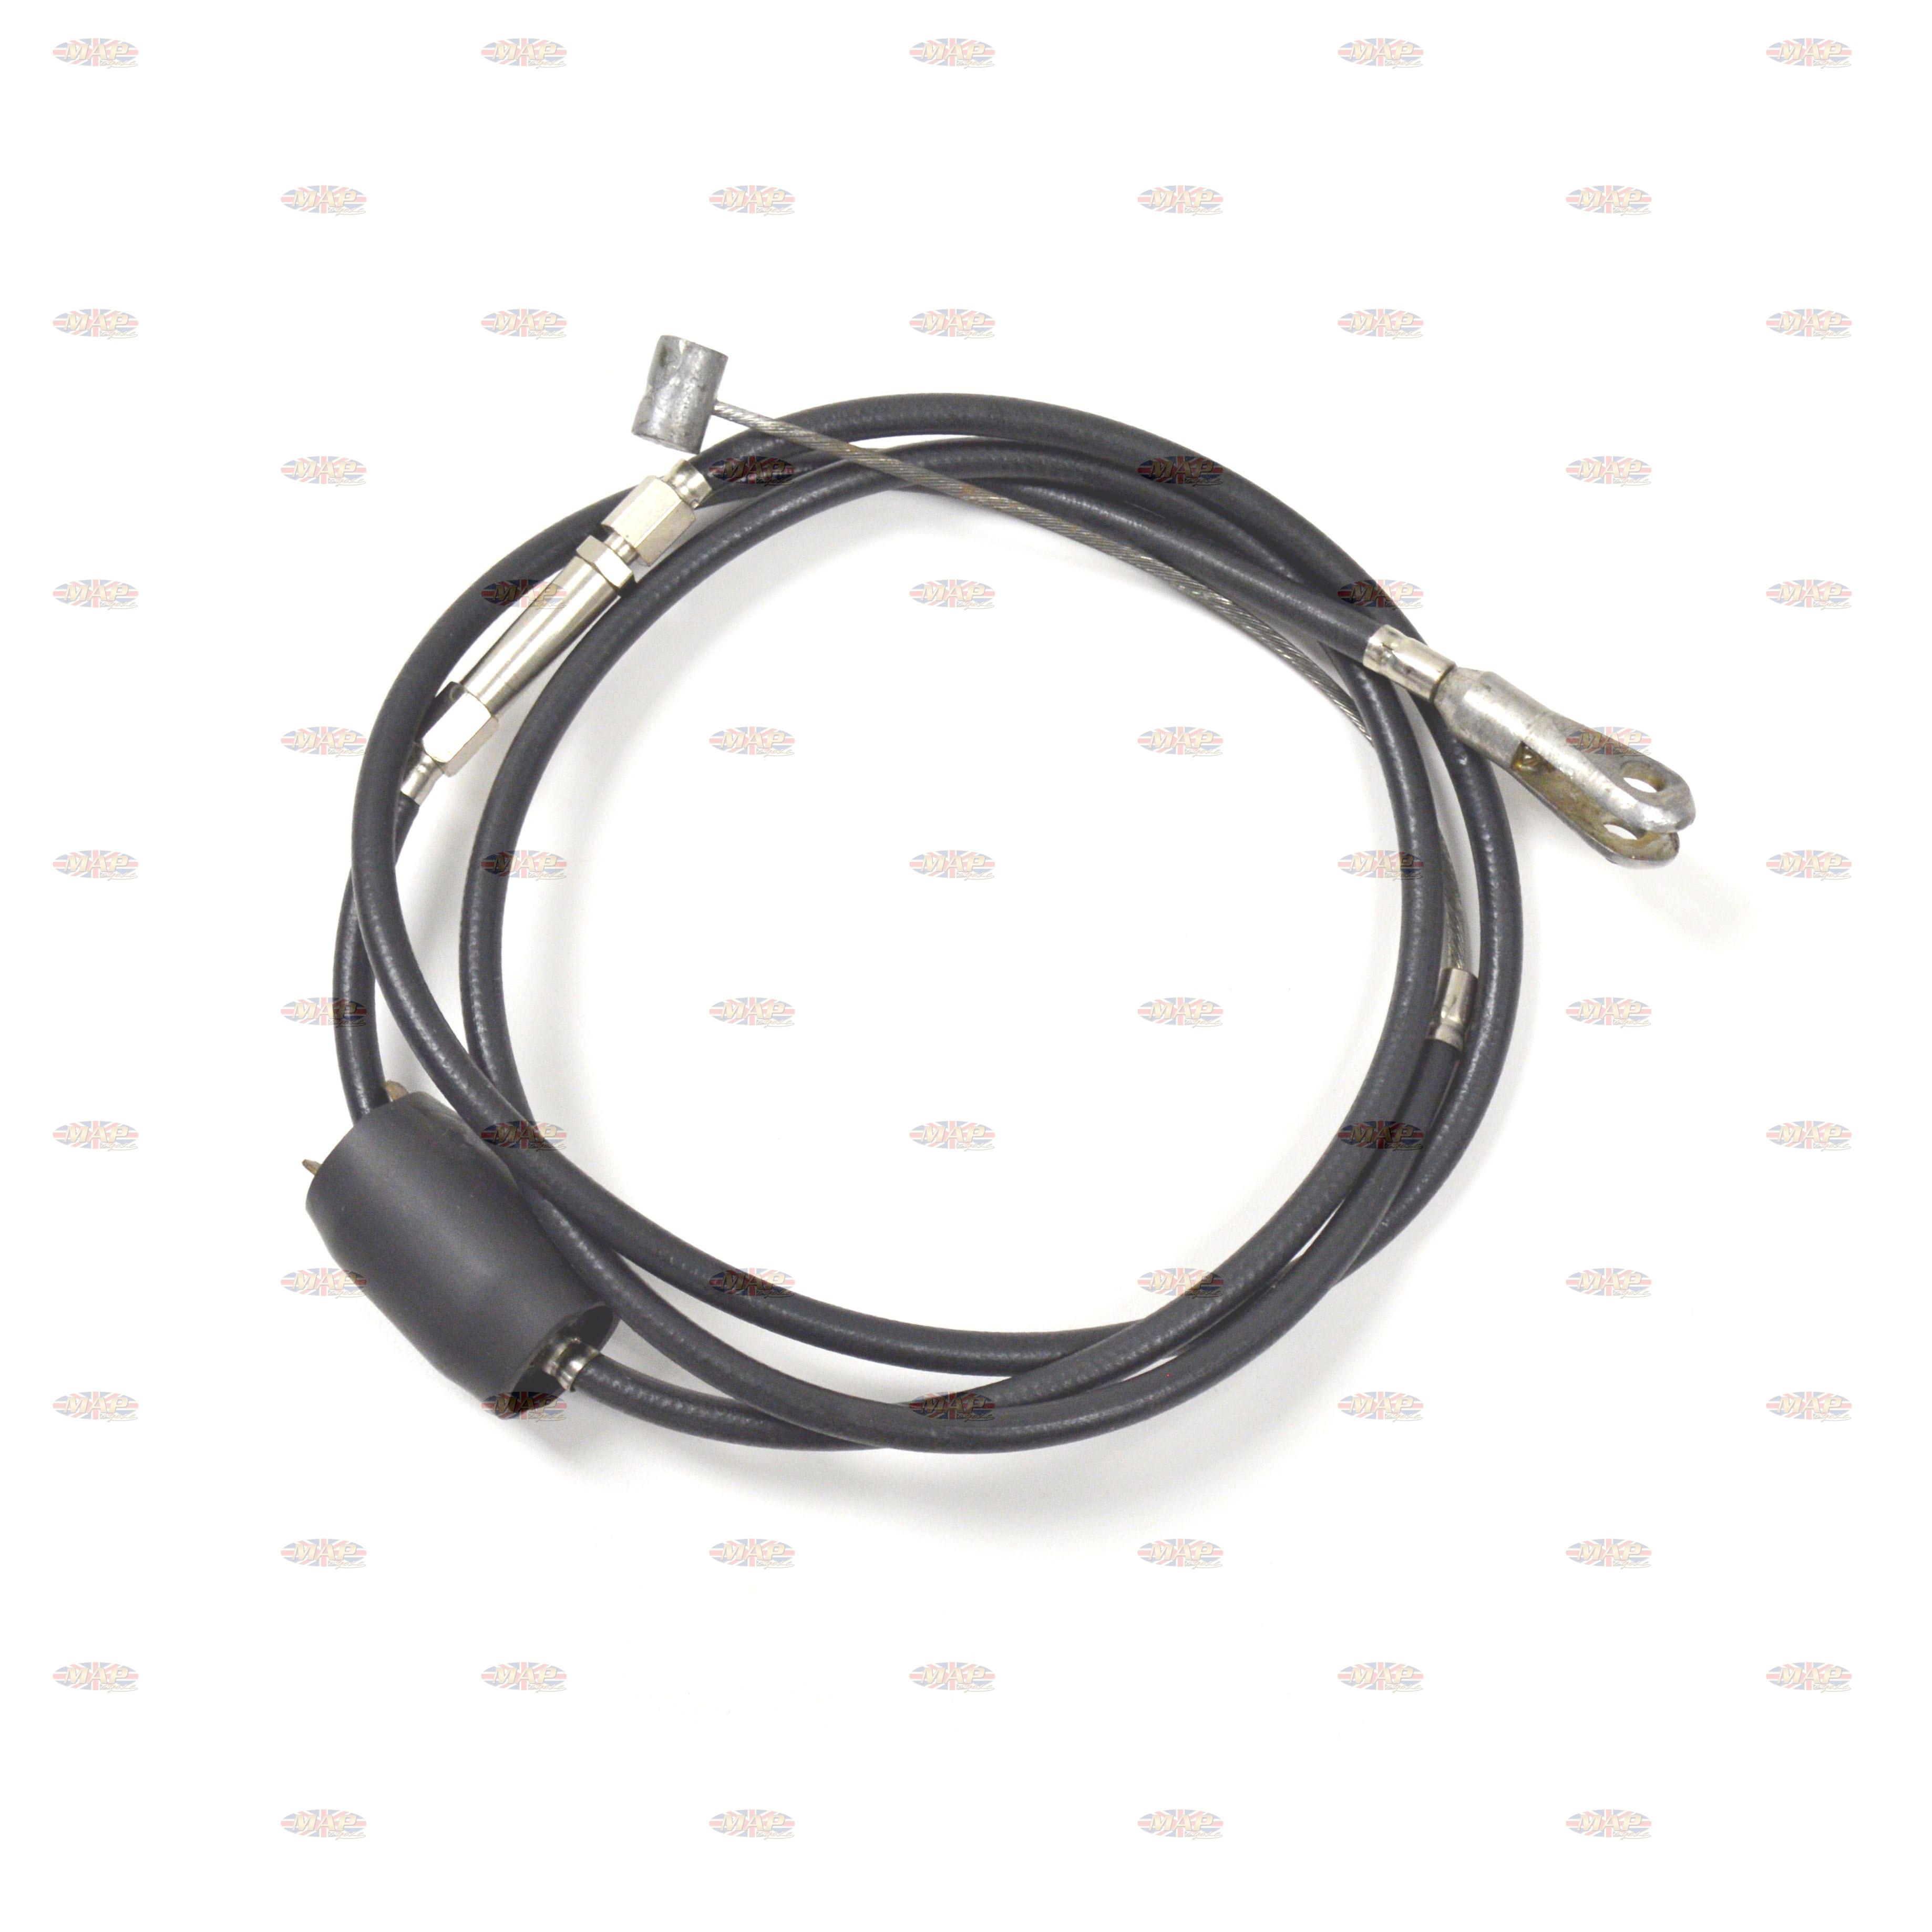 CABLE/ BRK TRI-BSA w/SWITCH (47  HIBAR) 60-2076/47